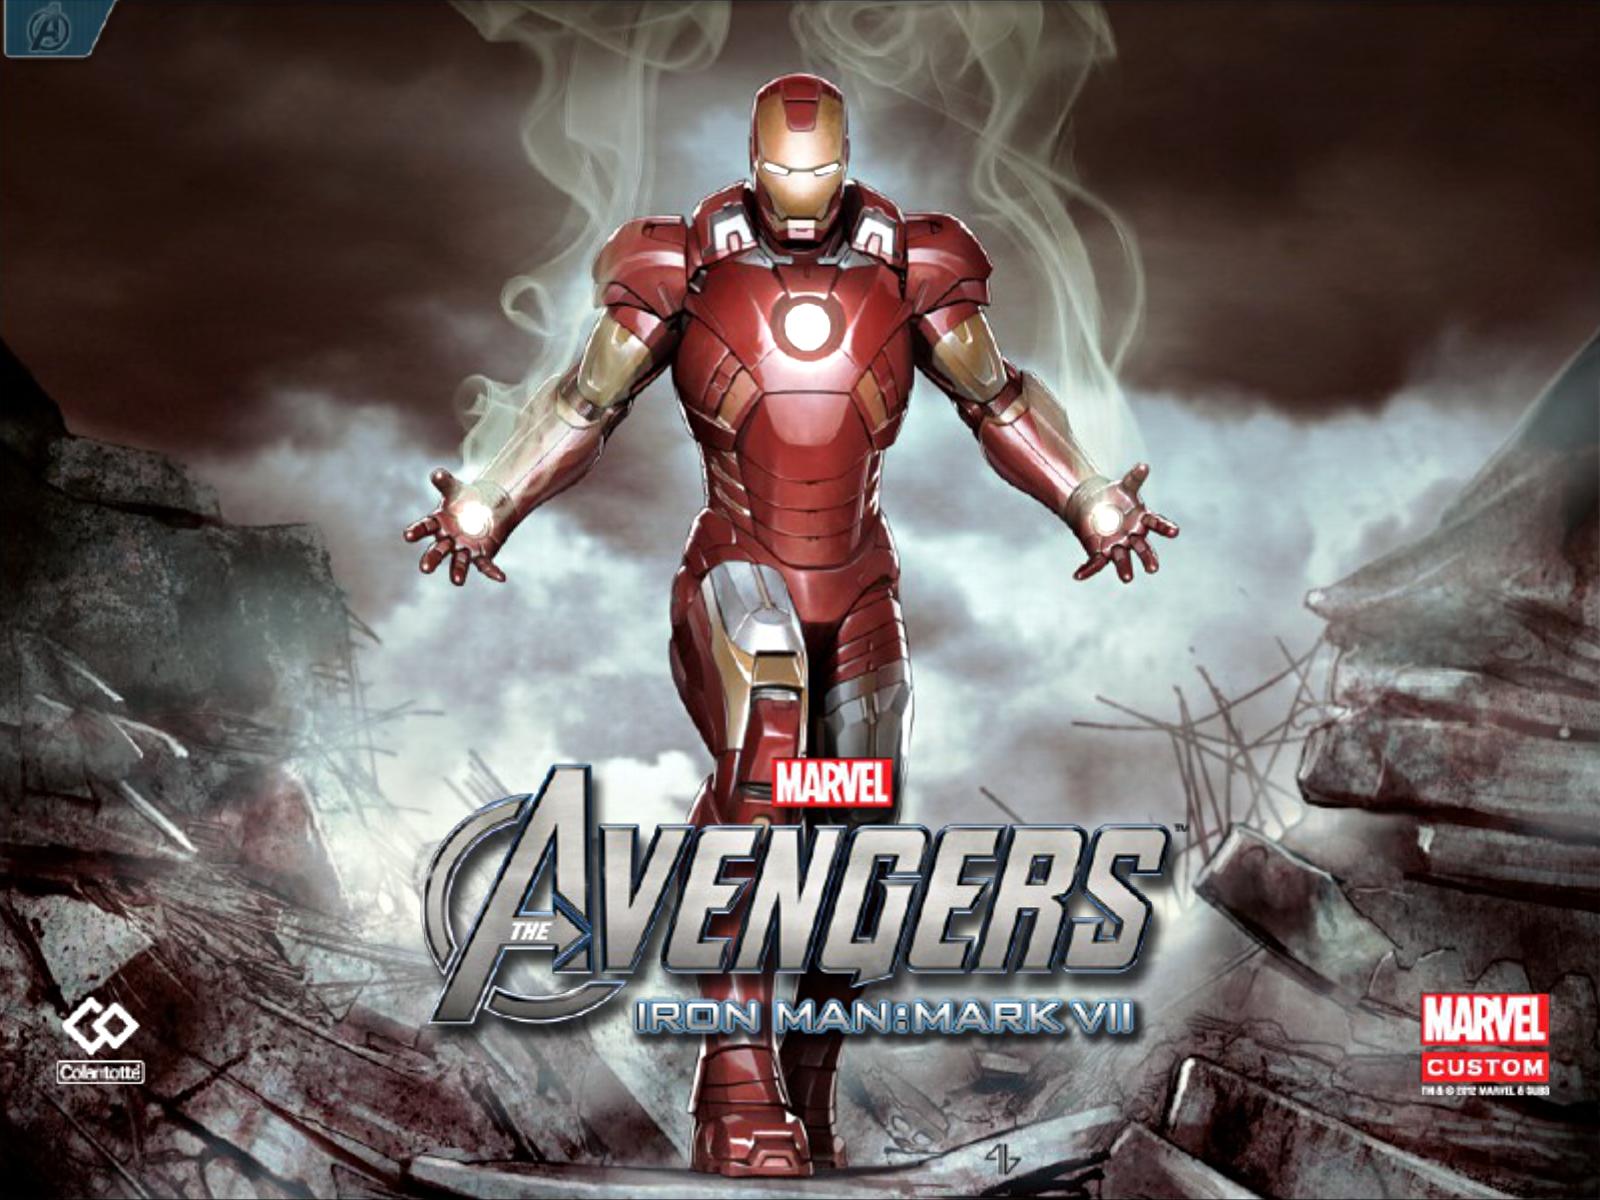 Mark Vii Iron Man Wiki The Avengers Iron Man Mark Vii